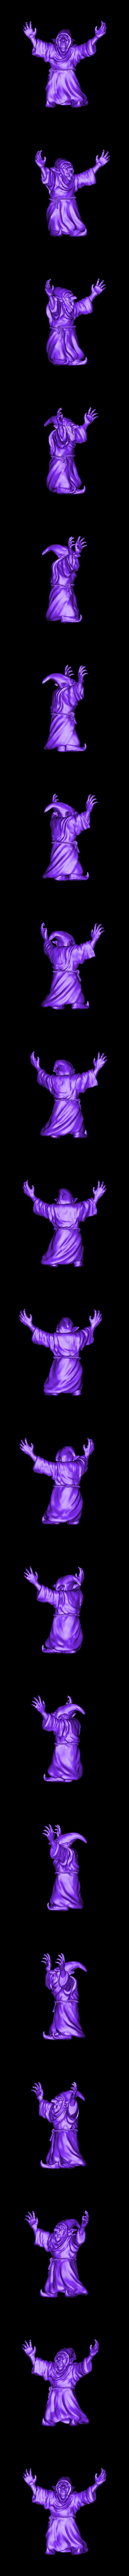 Bossgob_Complete.stl Download free STL file The Biggest Mouth • 3D printing design, Pariah_prints